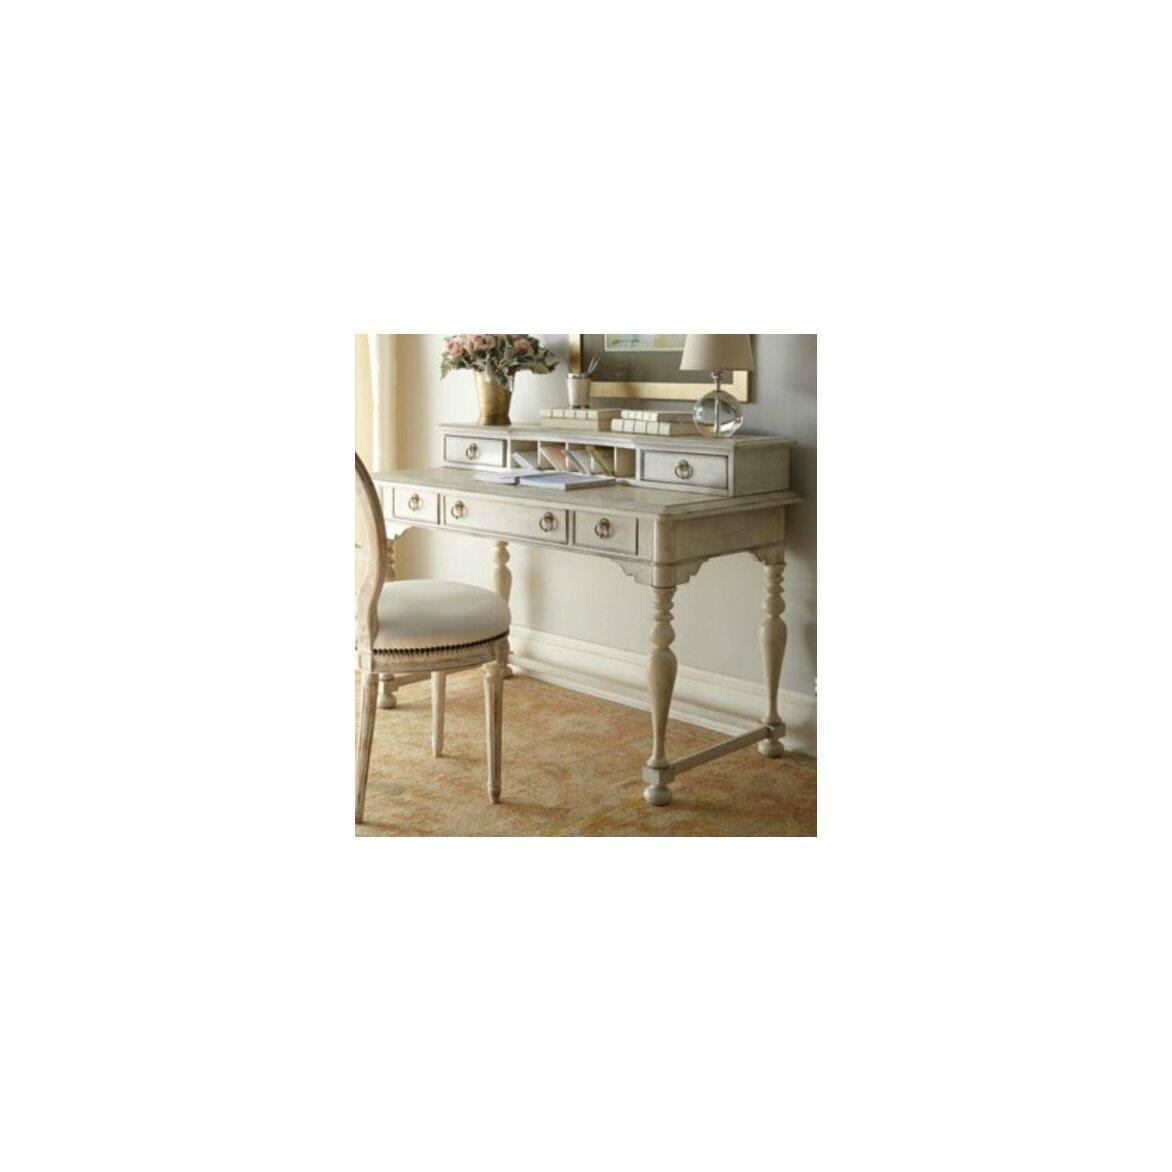 Письменный стол Sinley 4 | Письменные столы Kingsby